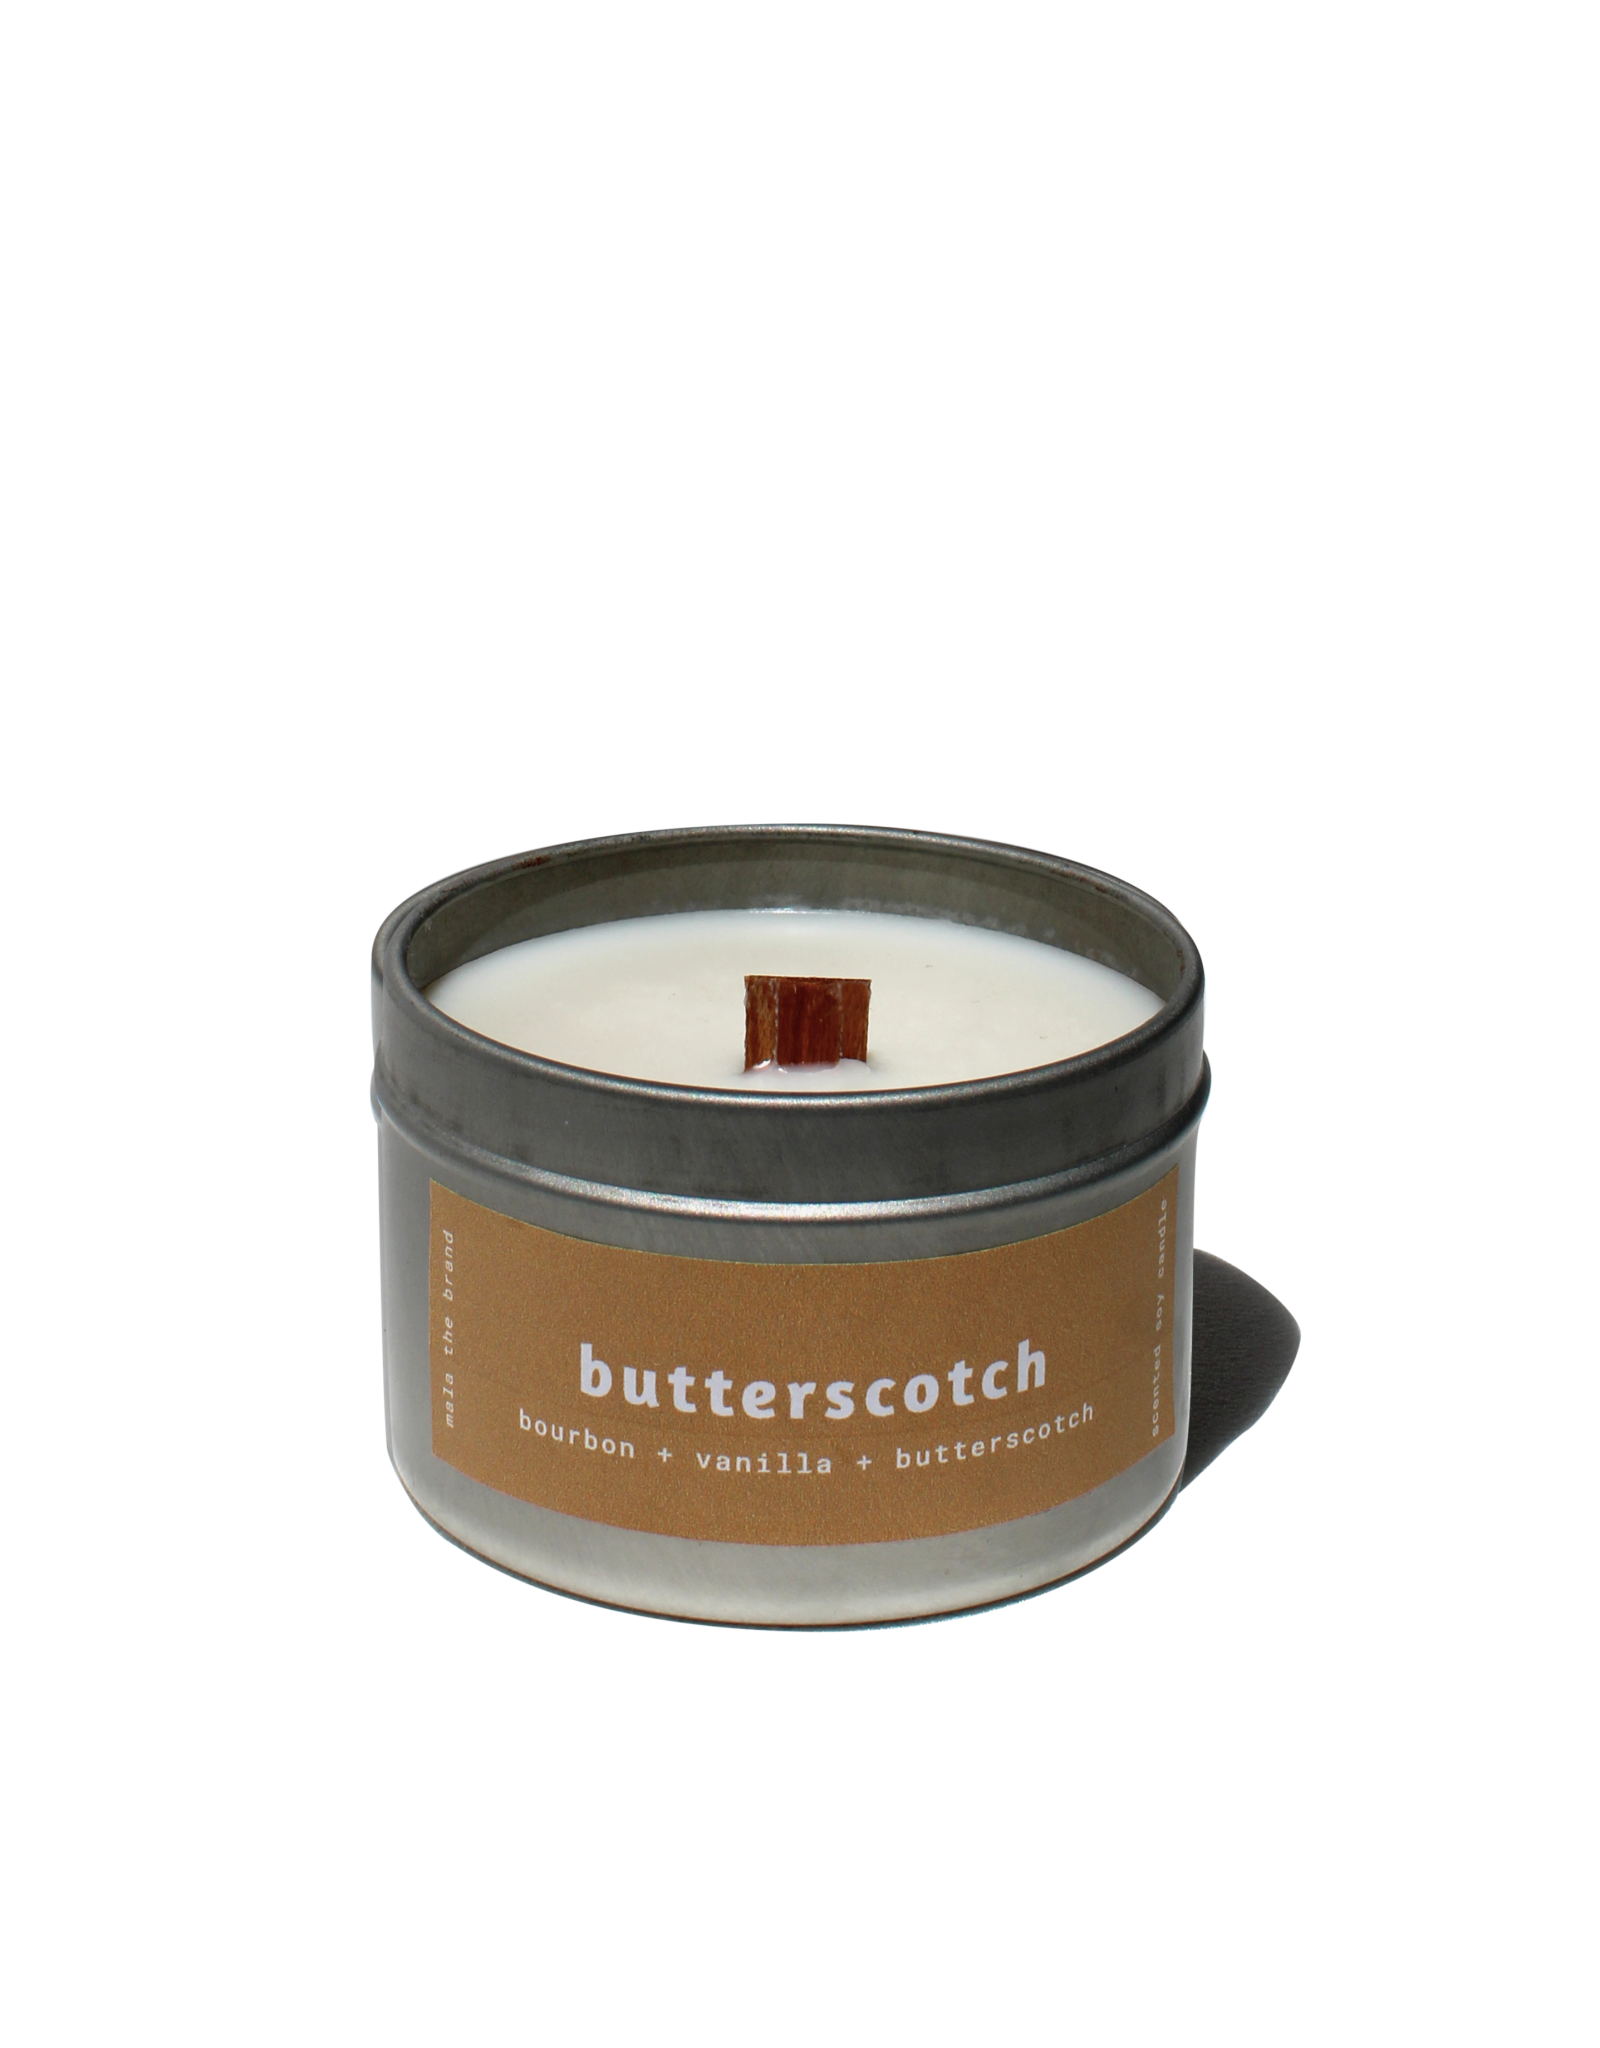 Mala The Brand Butterscotch Candle / Bourbon + Vanilla + Butterscotch 4 oz